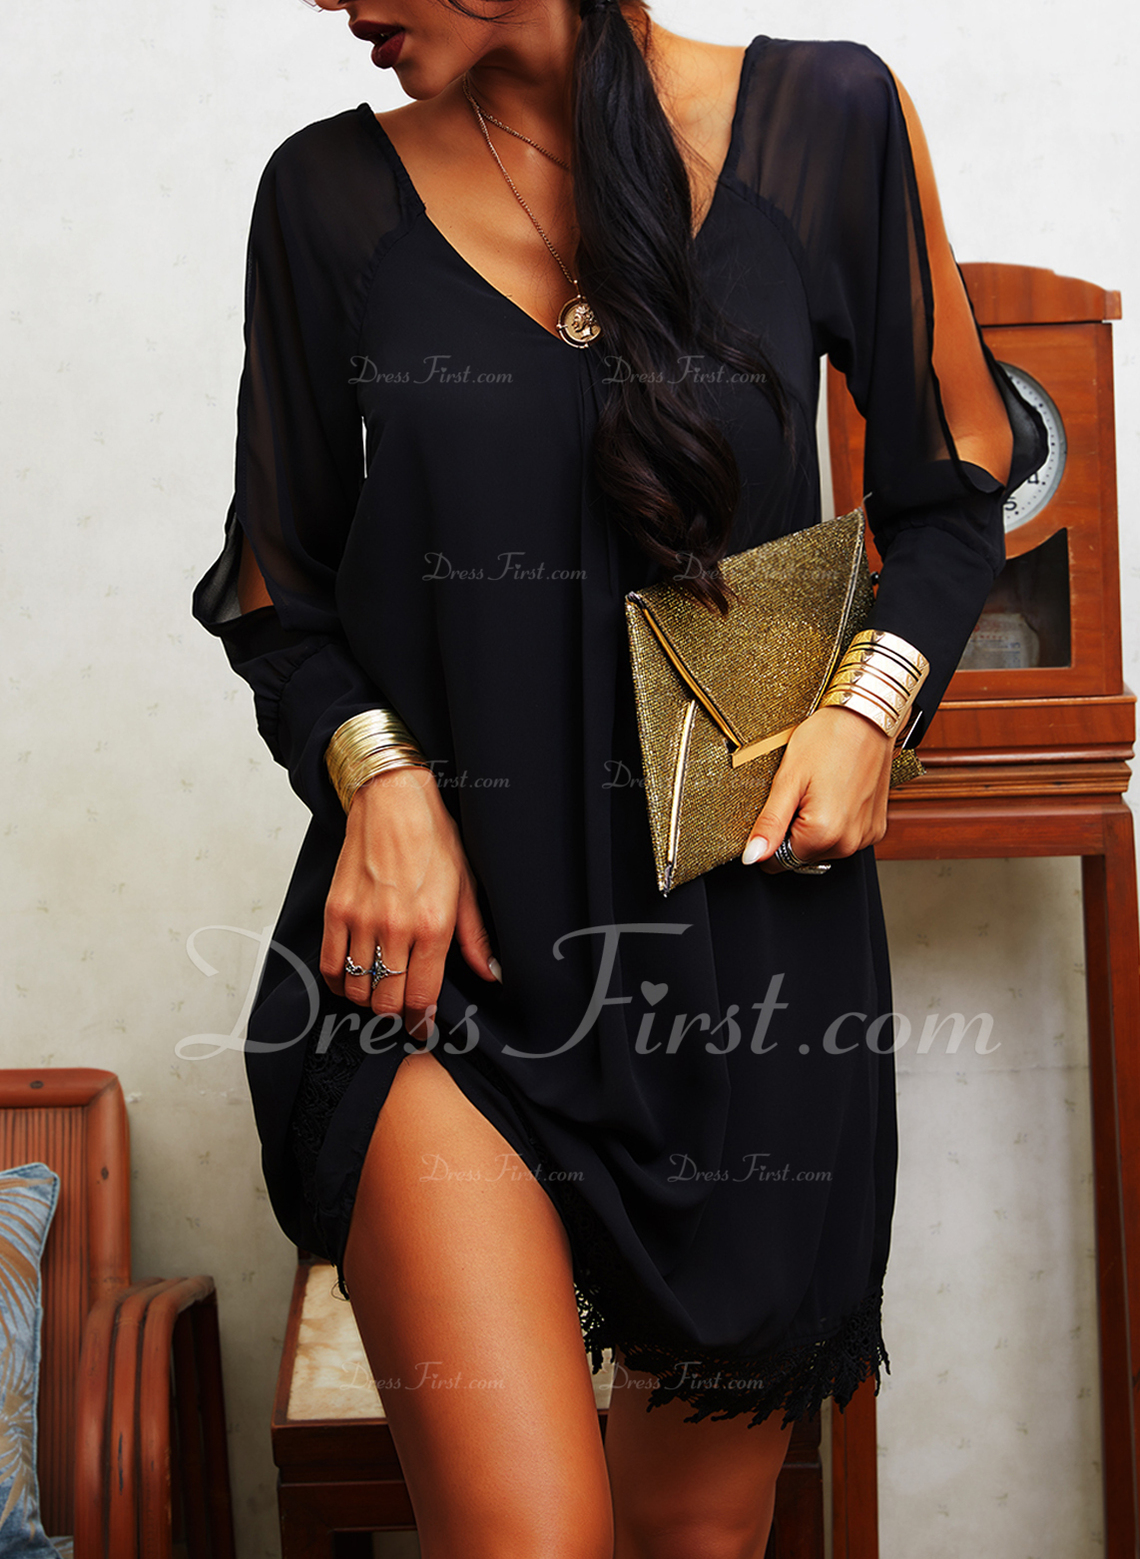 Dantel Solid Shift Elbiseleri Mânecă cu umerii goi Mâneci Lungi Mini Negre gündelik Tatil Tunică Moda Elbiseler